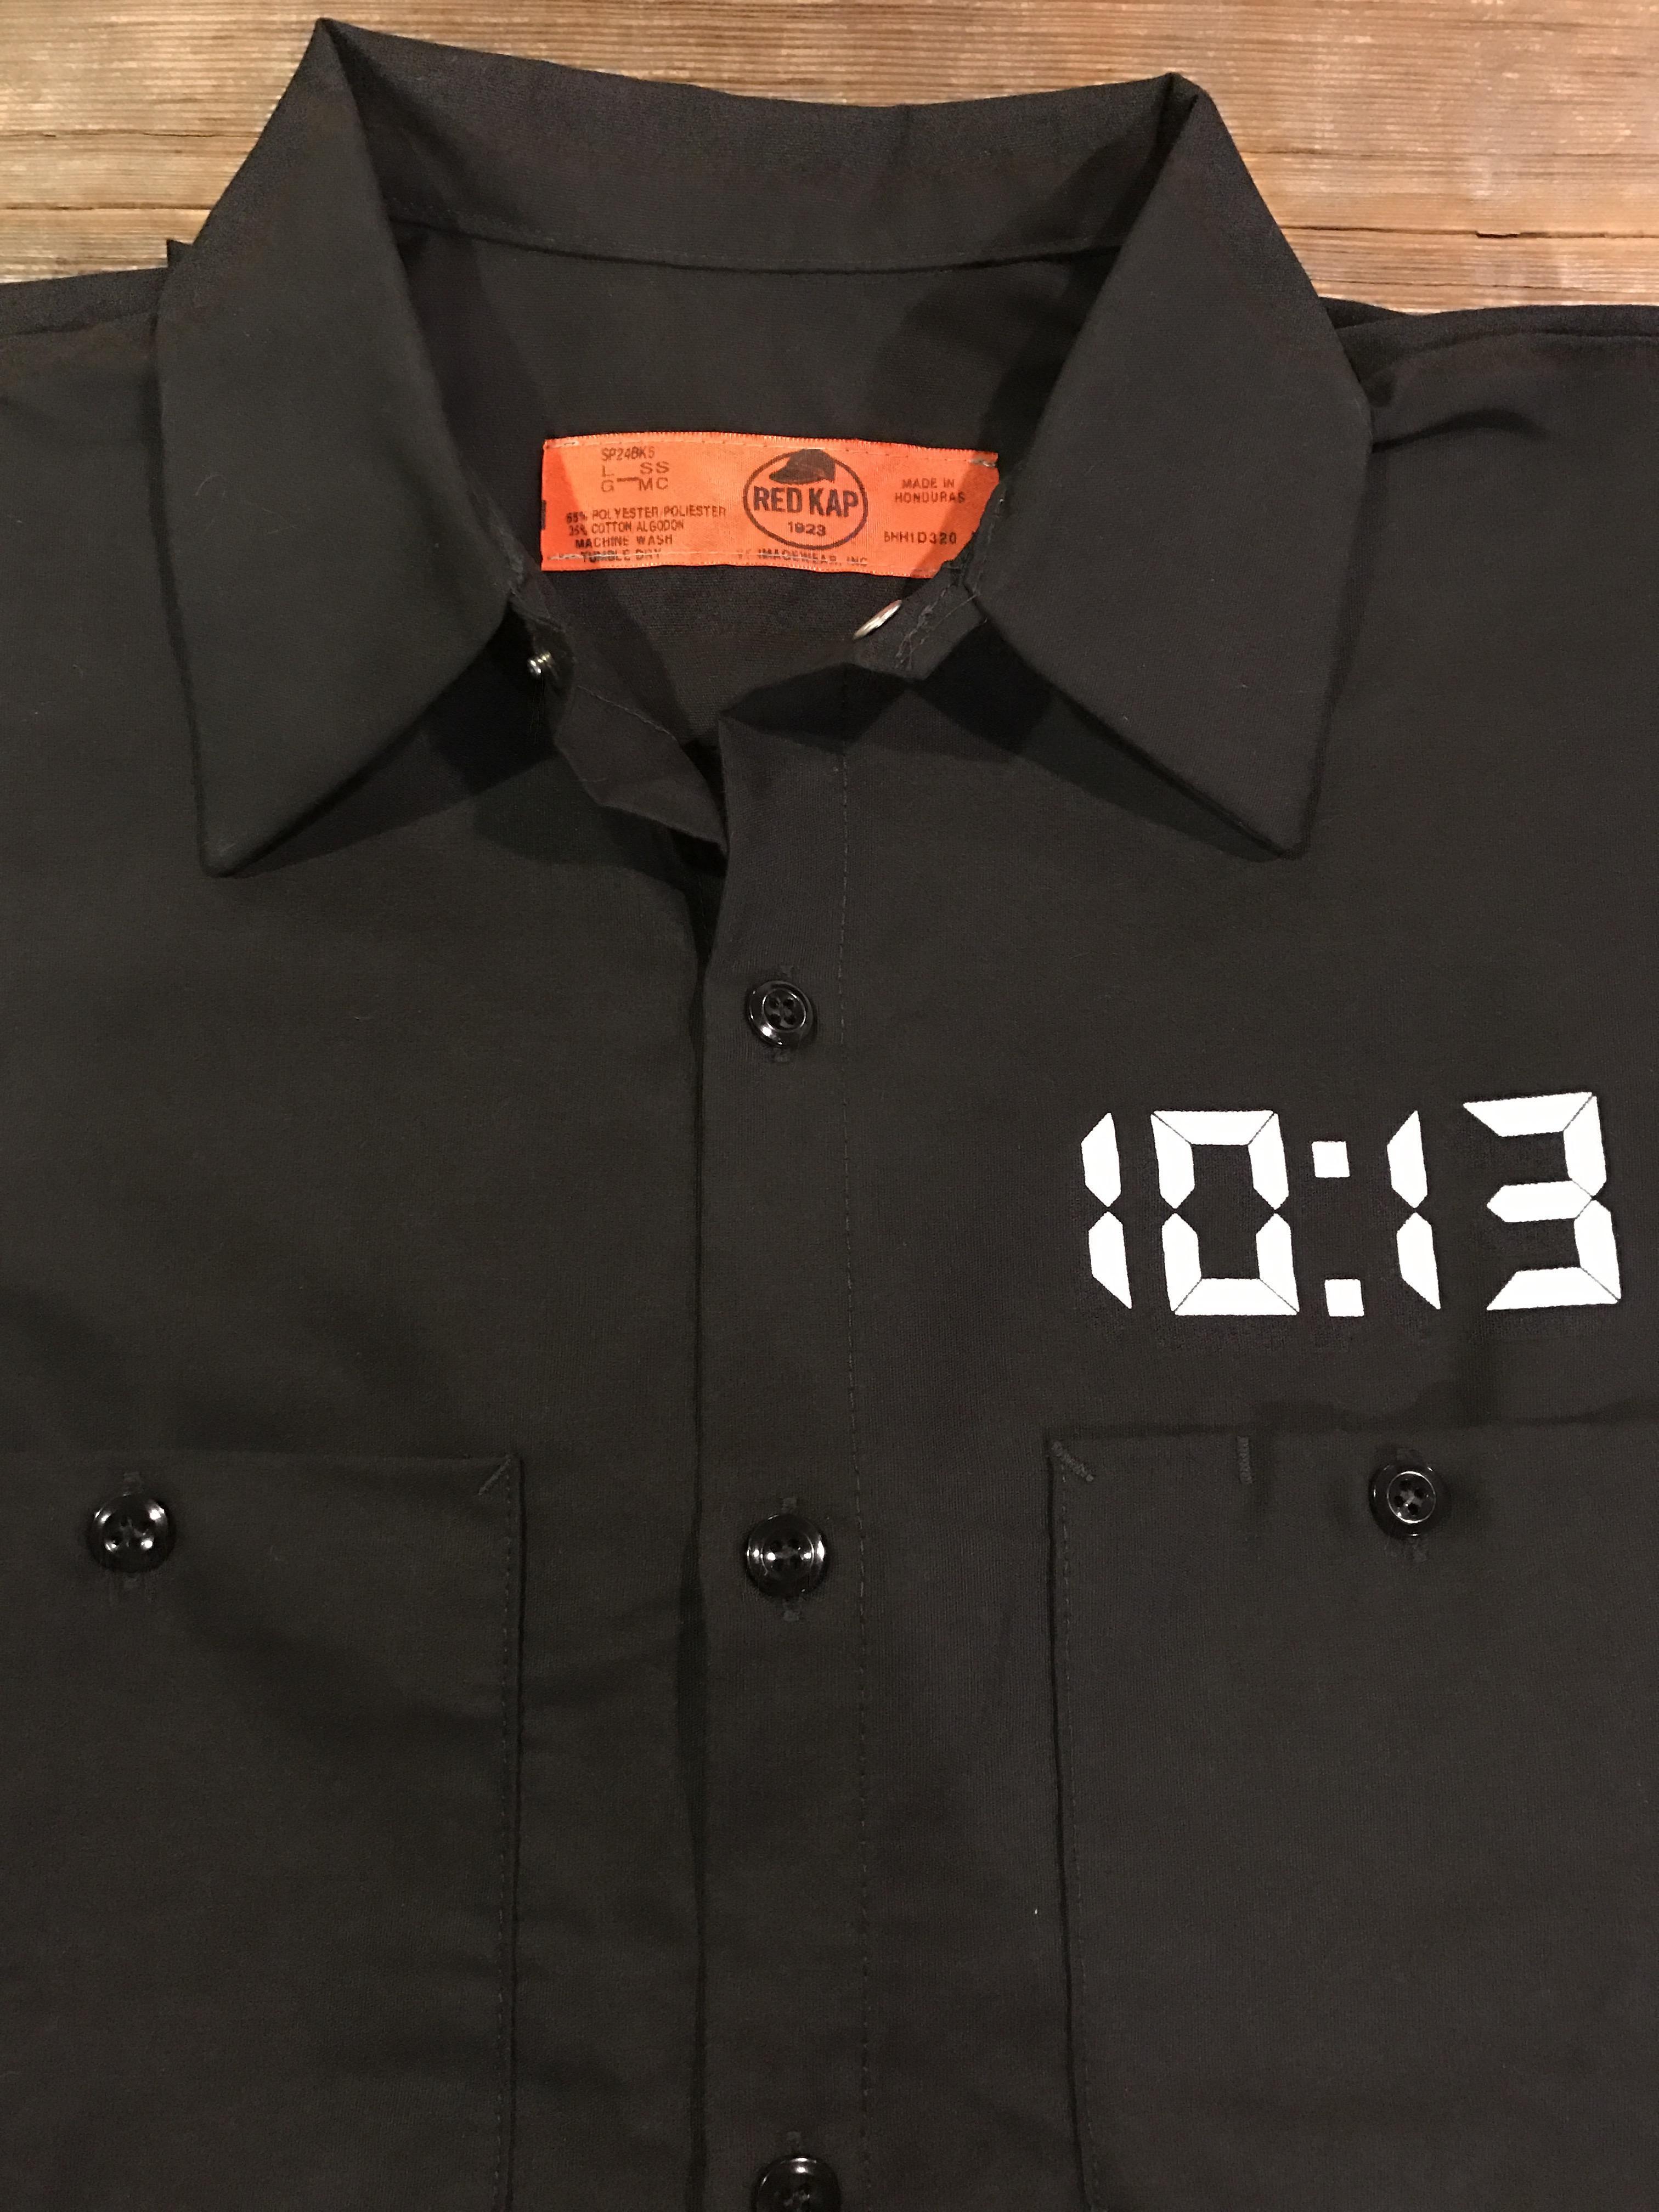 Design Work Shirts